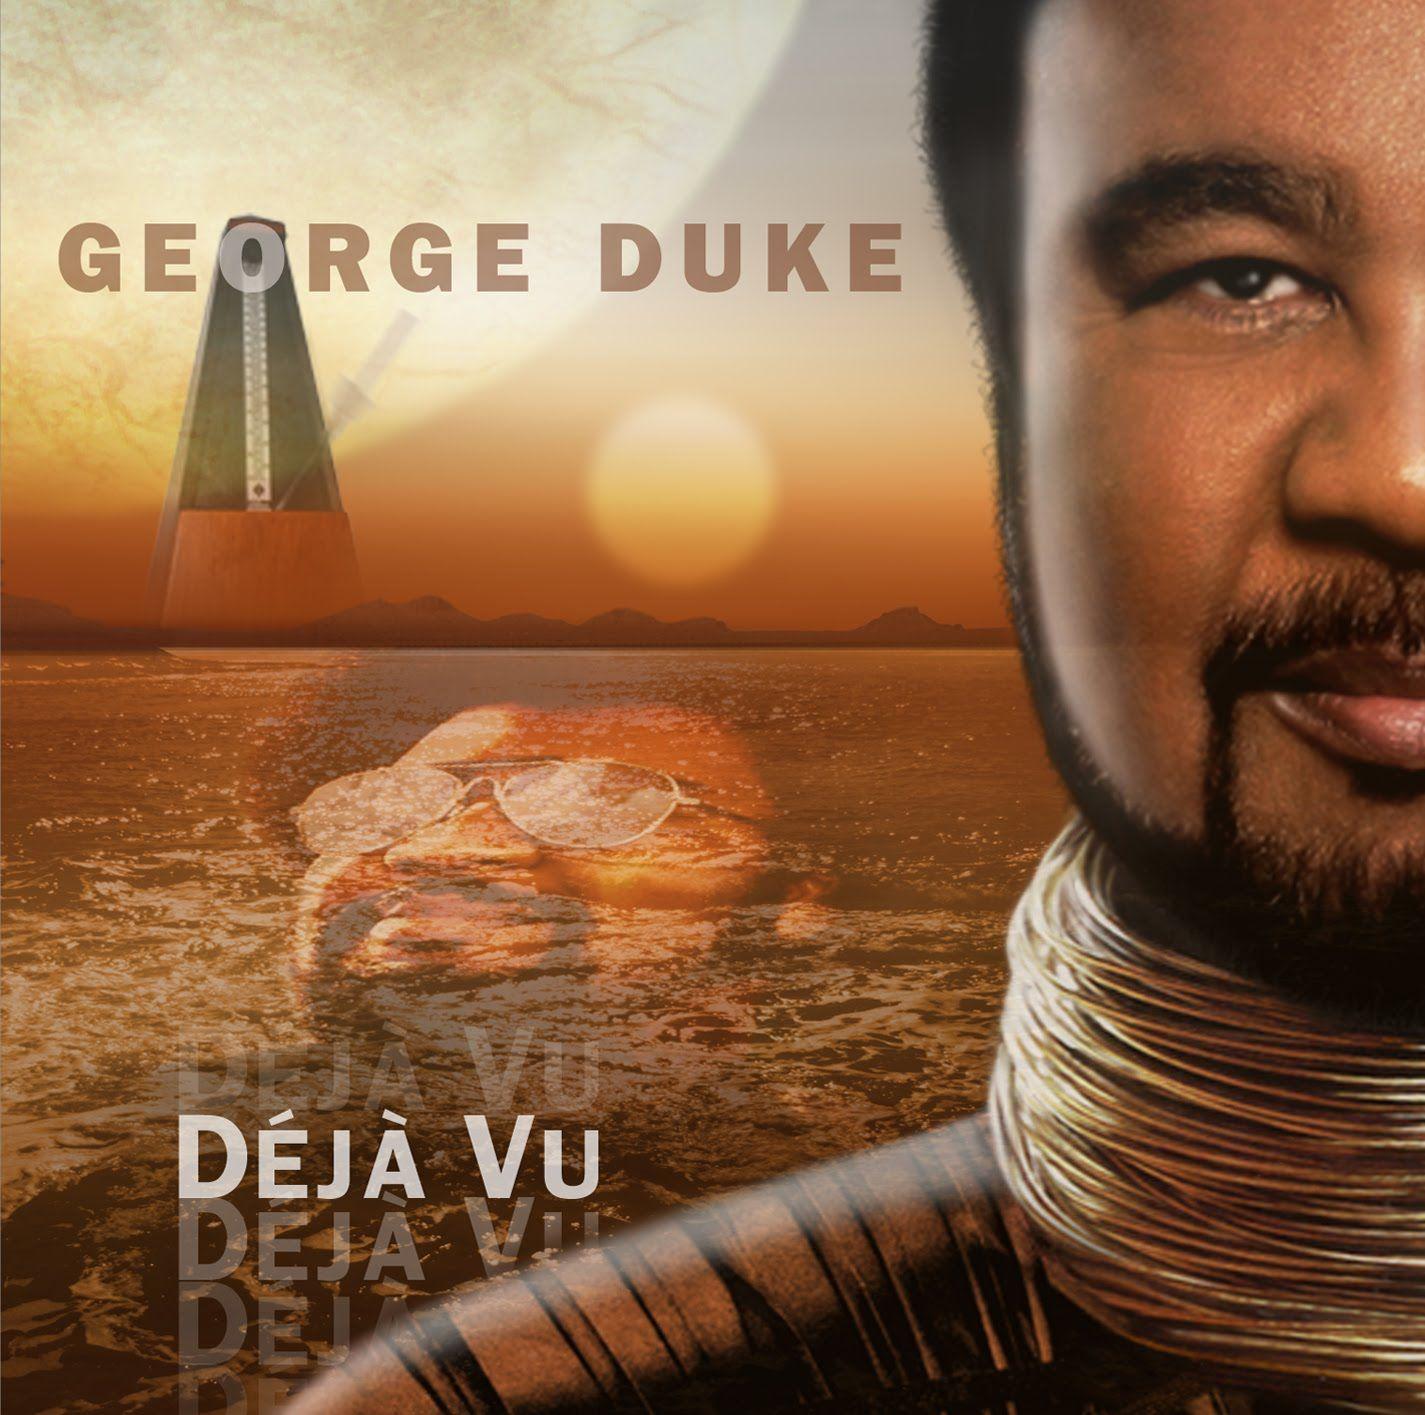 George Duke Revisits The Sounds Of The Golden Age Of Funk And Soul On Déjà Vu. Features guest performances by trumpeter Nicholas Payton,flutist Hubert Laws ...